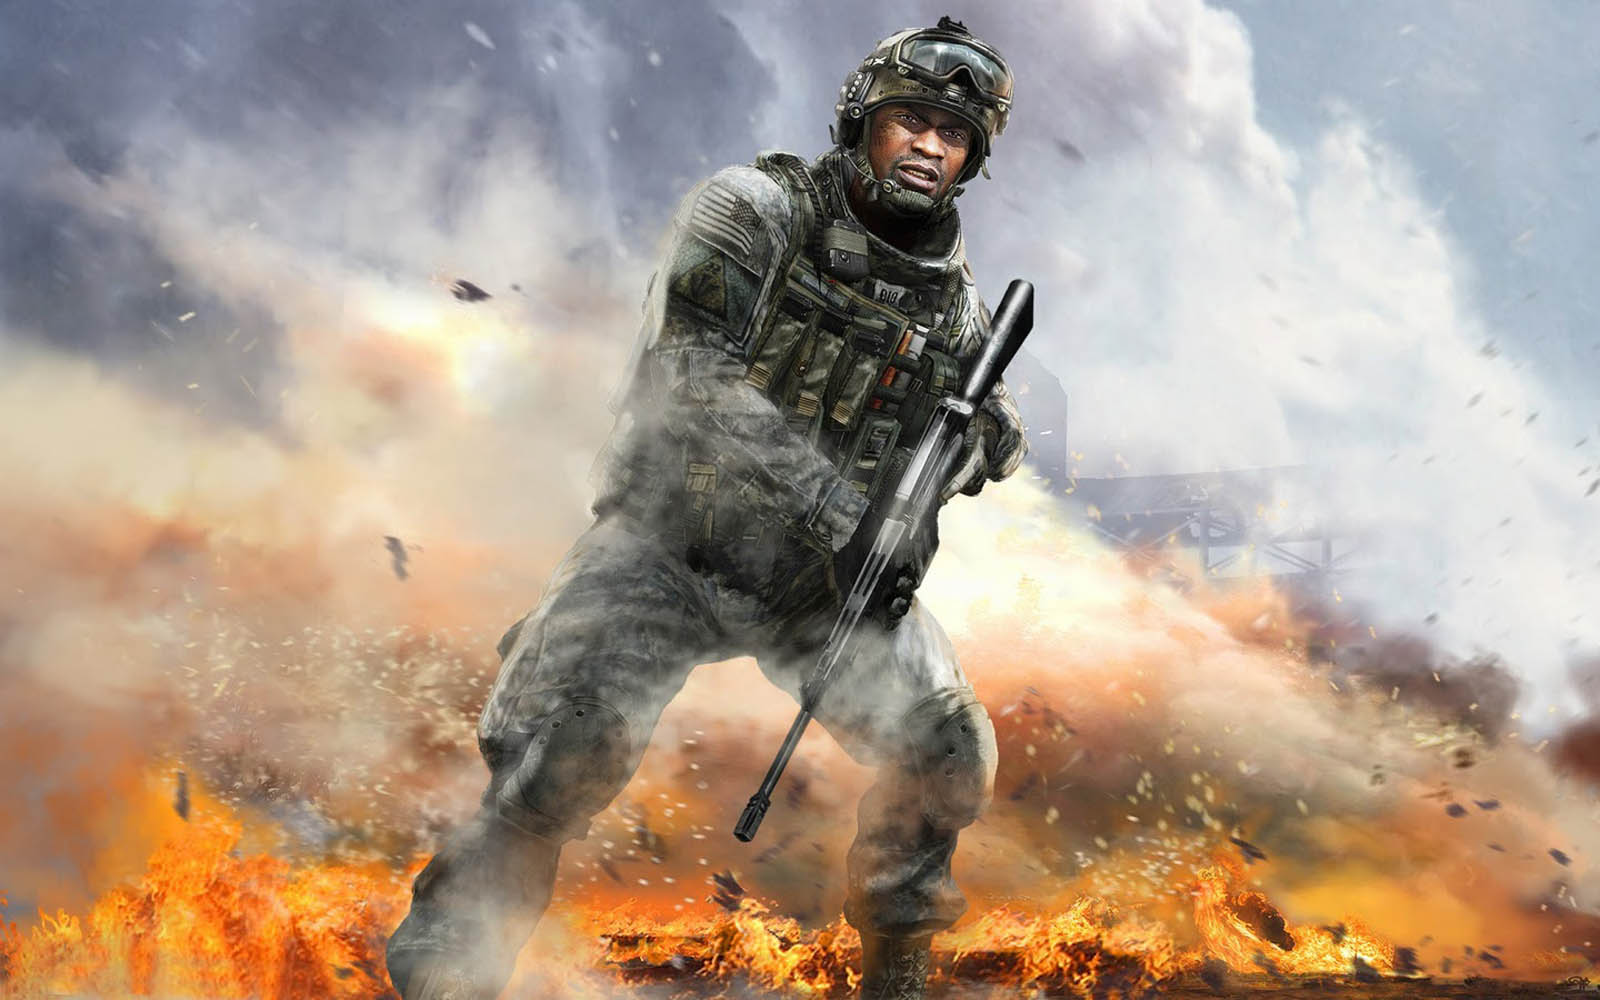 Wallpaper: Call Of Duty Modern Warfare 3 Wallpapers